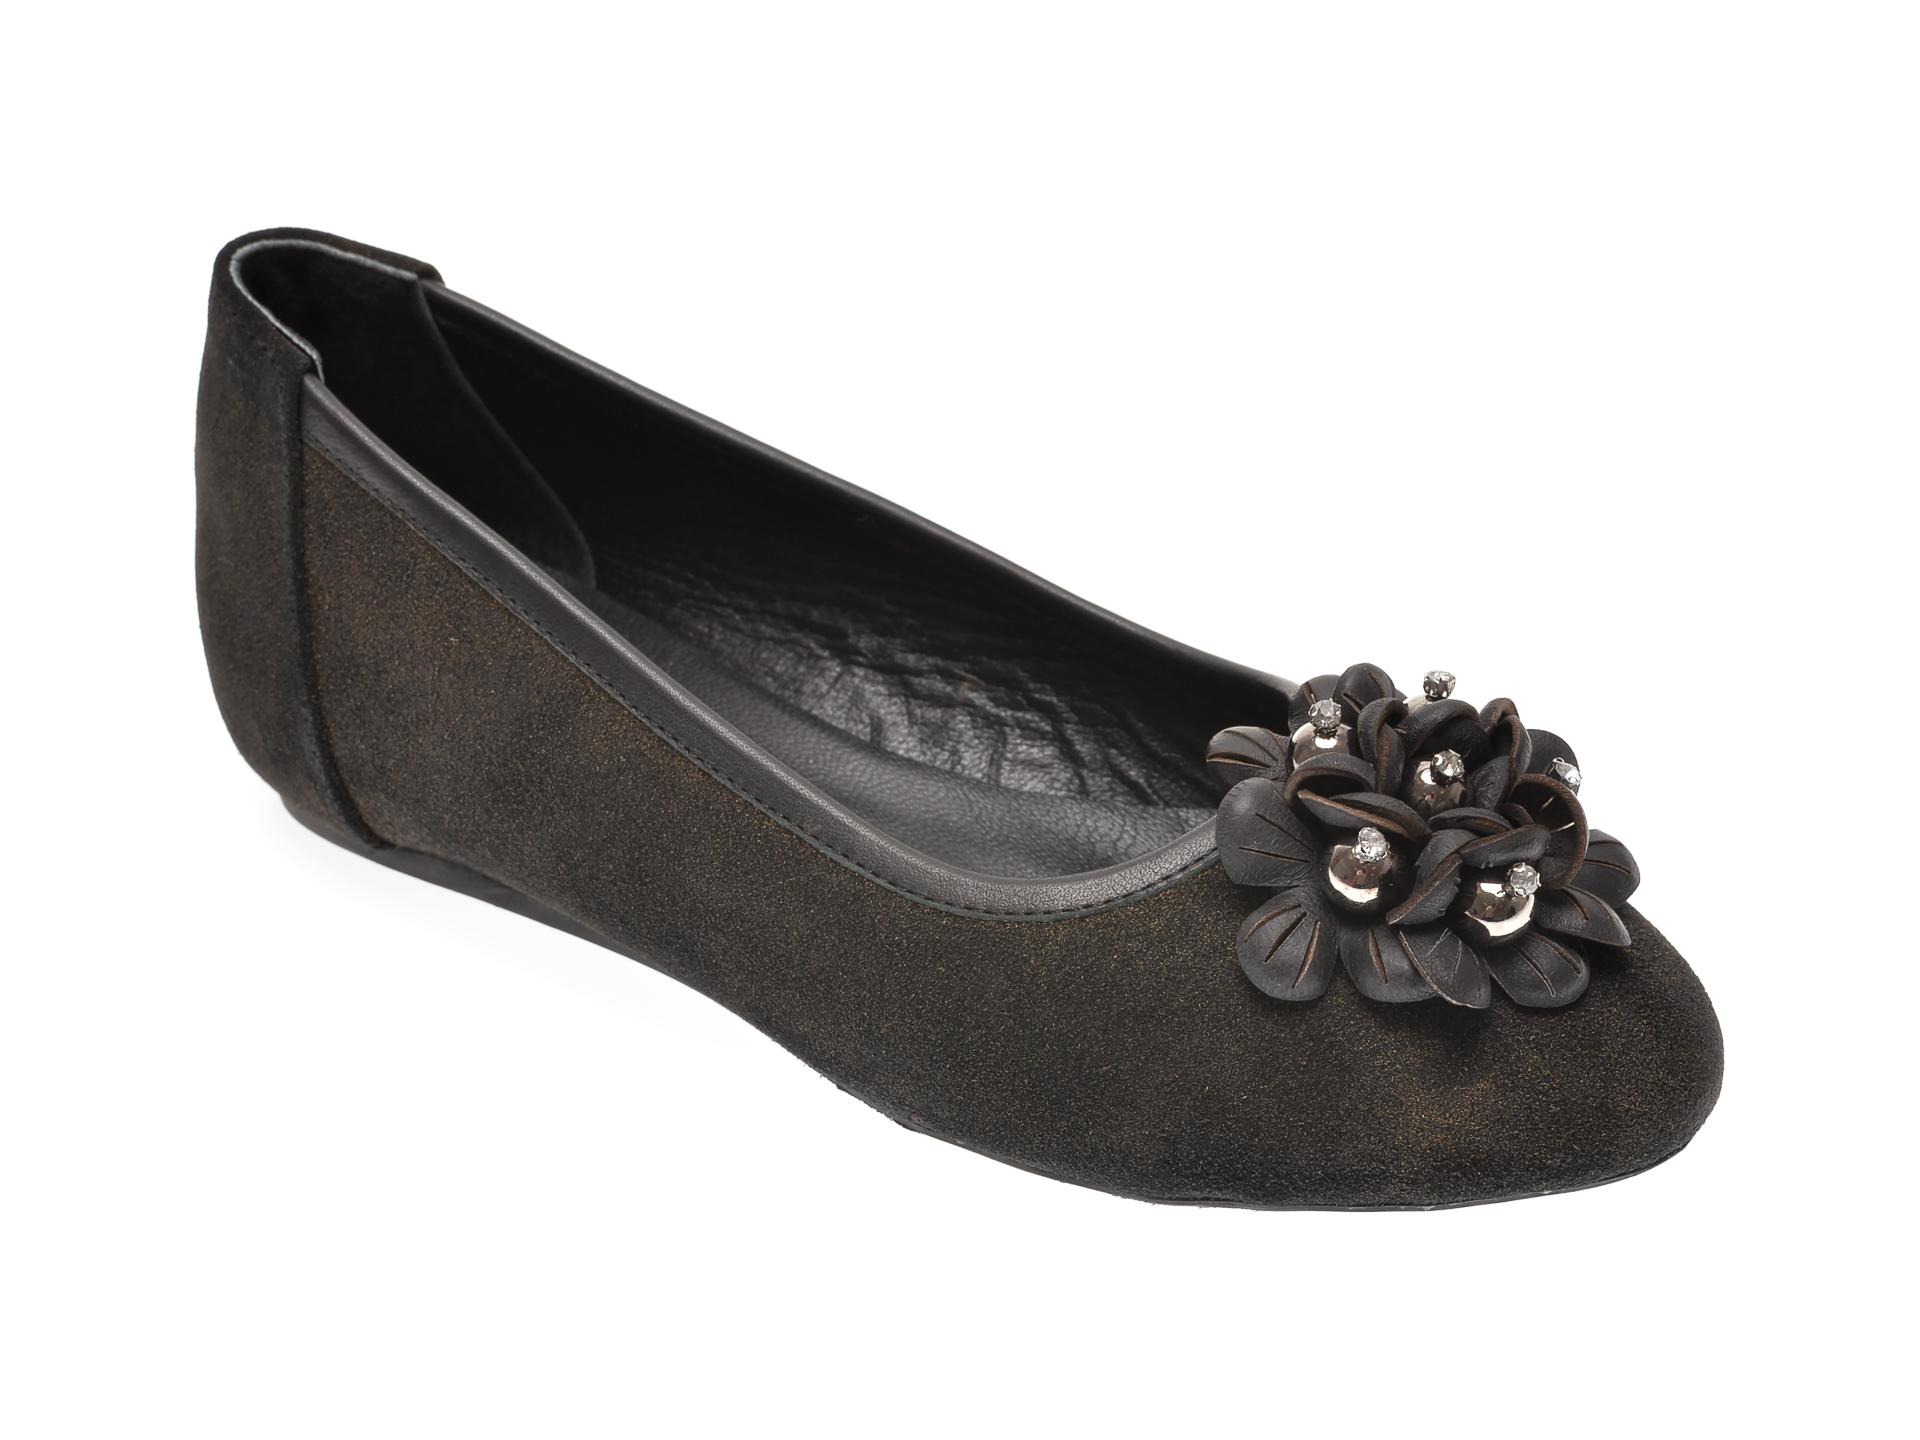 Pantofi MESSIMODA kaki, 18K1420, din piele intoarsa imagine